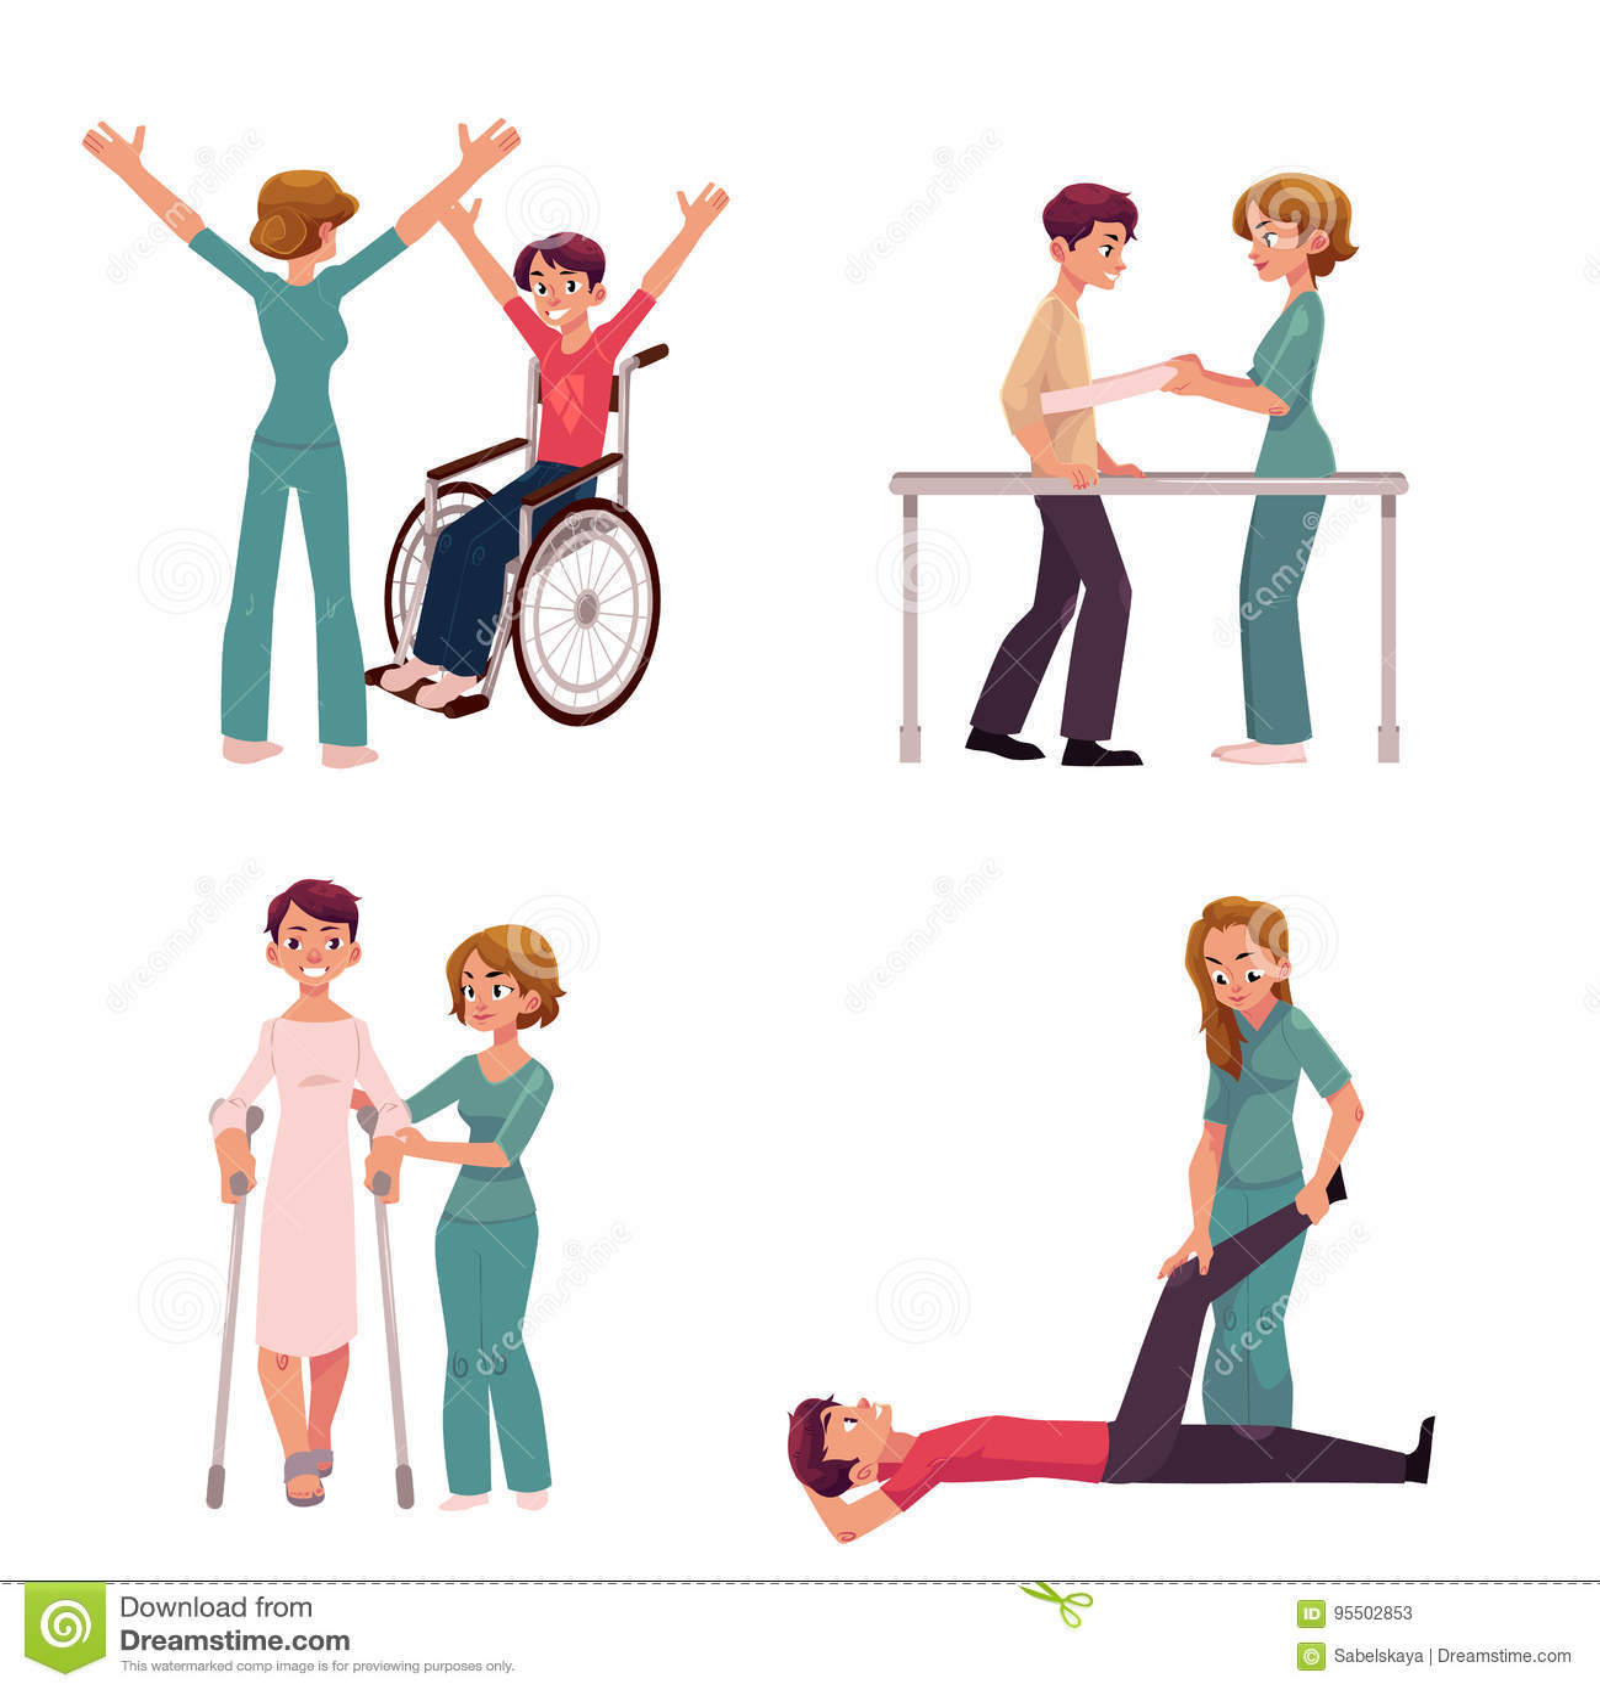 Cartoon physical therapy - Cartoon Illustration Medical Nurse Physical Physiotherapist Rehabilitation Therapy